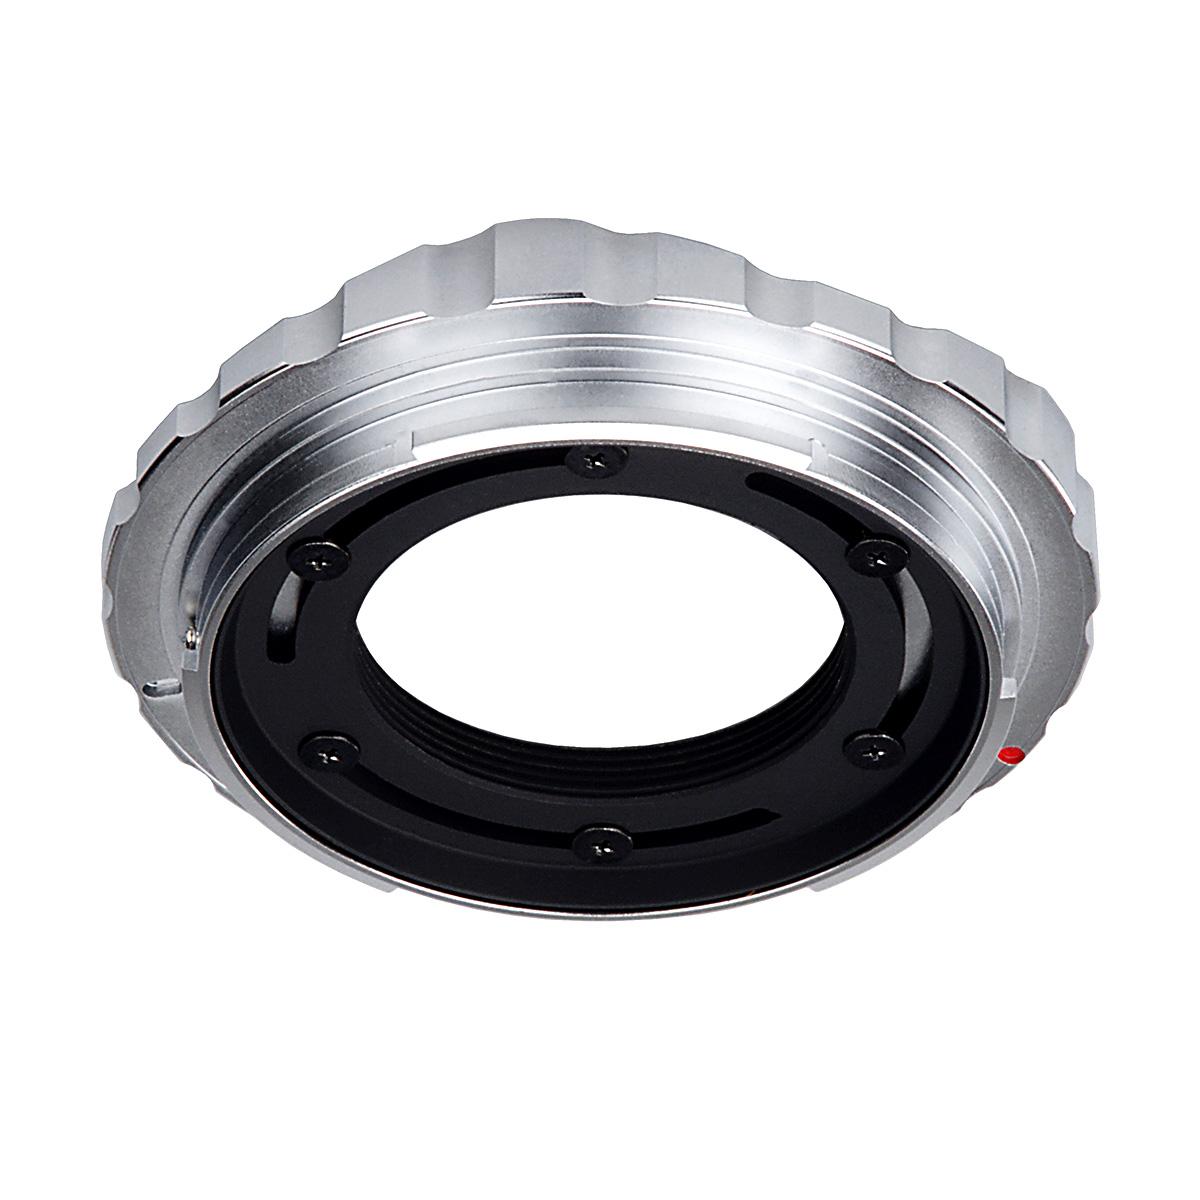 Fotodiox L39-GFX(ライカL39マウントレンズ → 富士フイルムGマウント変換)アジャスト機能付きマウントアダプター